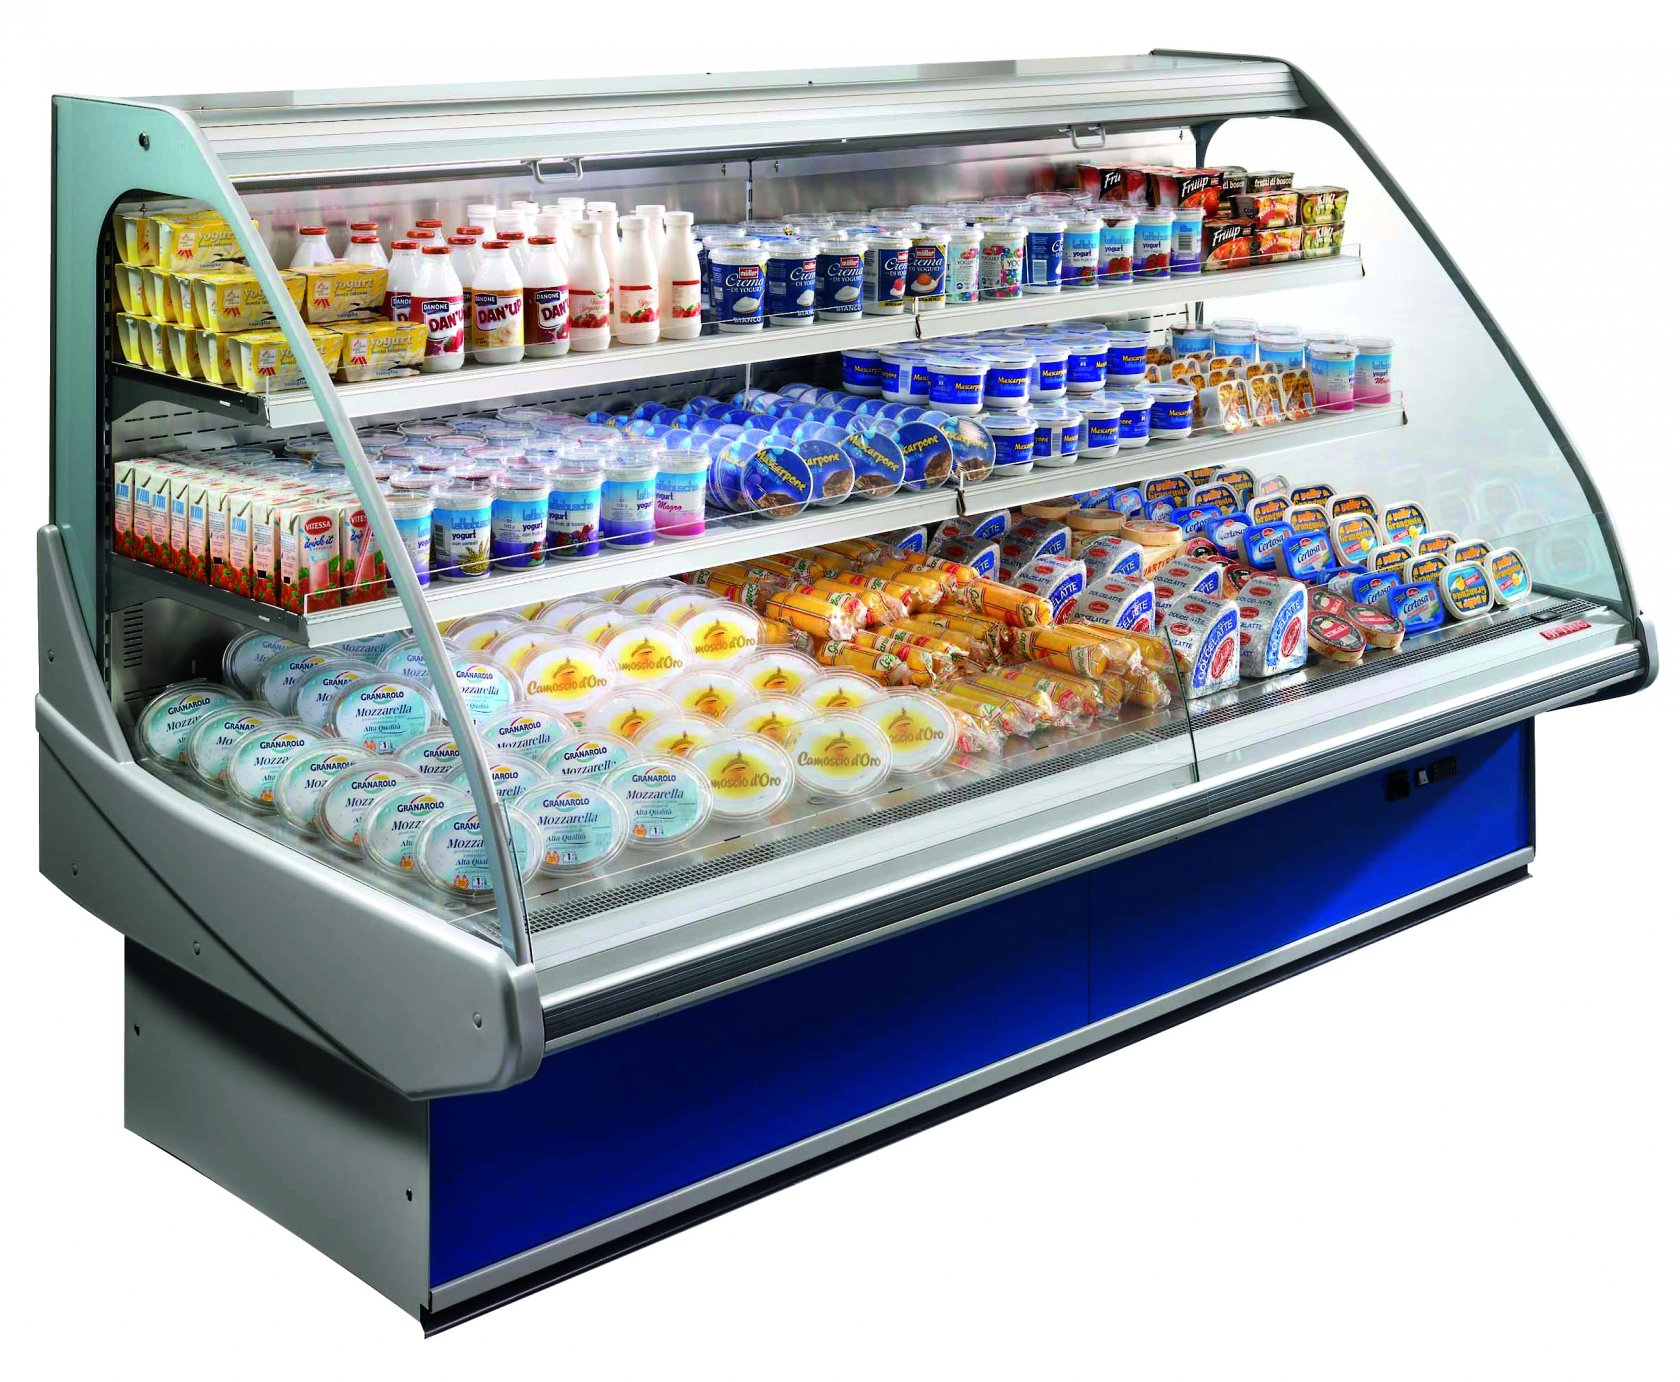 Professional Refrigerator Repair Service